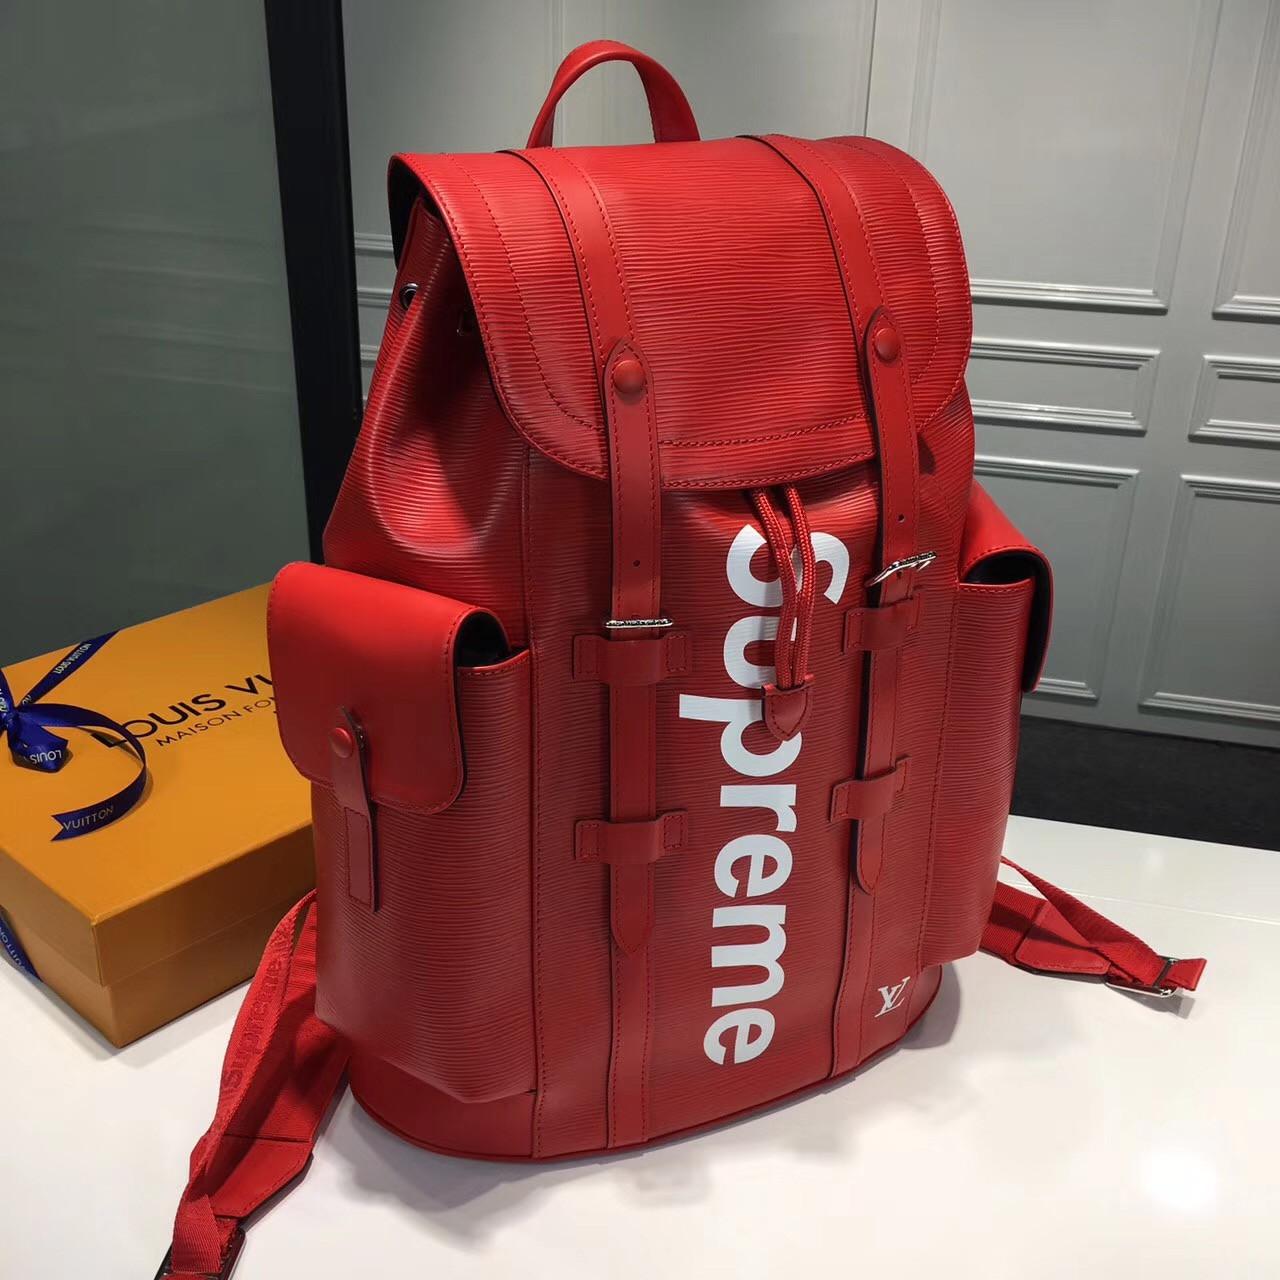 5c9b44abfba4 Рюкзак Supreme Louis Vuitton, цена 10 990 грн., купить в Киеве — Prom.ua  (ID#618786318)